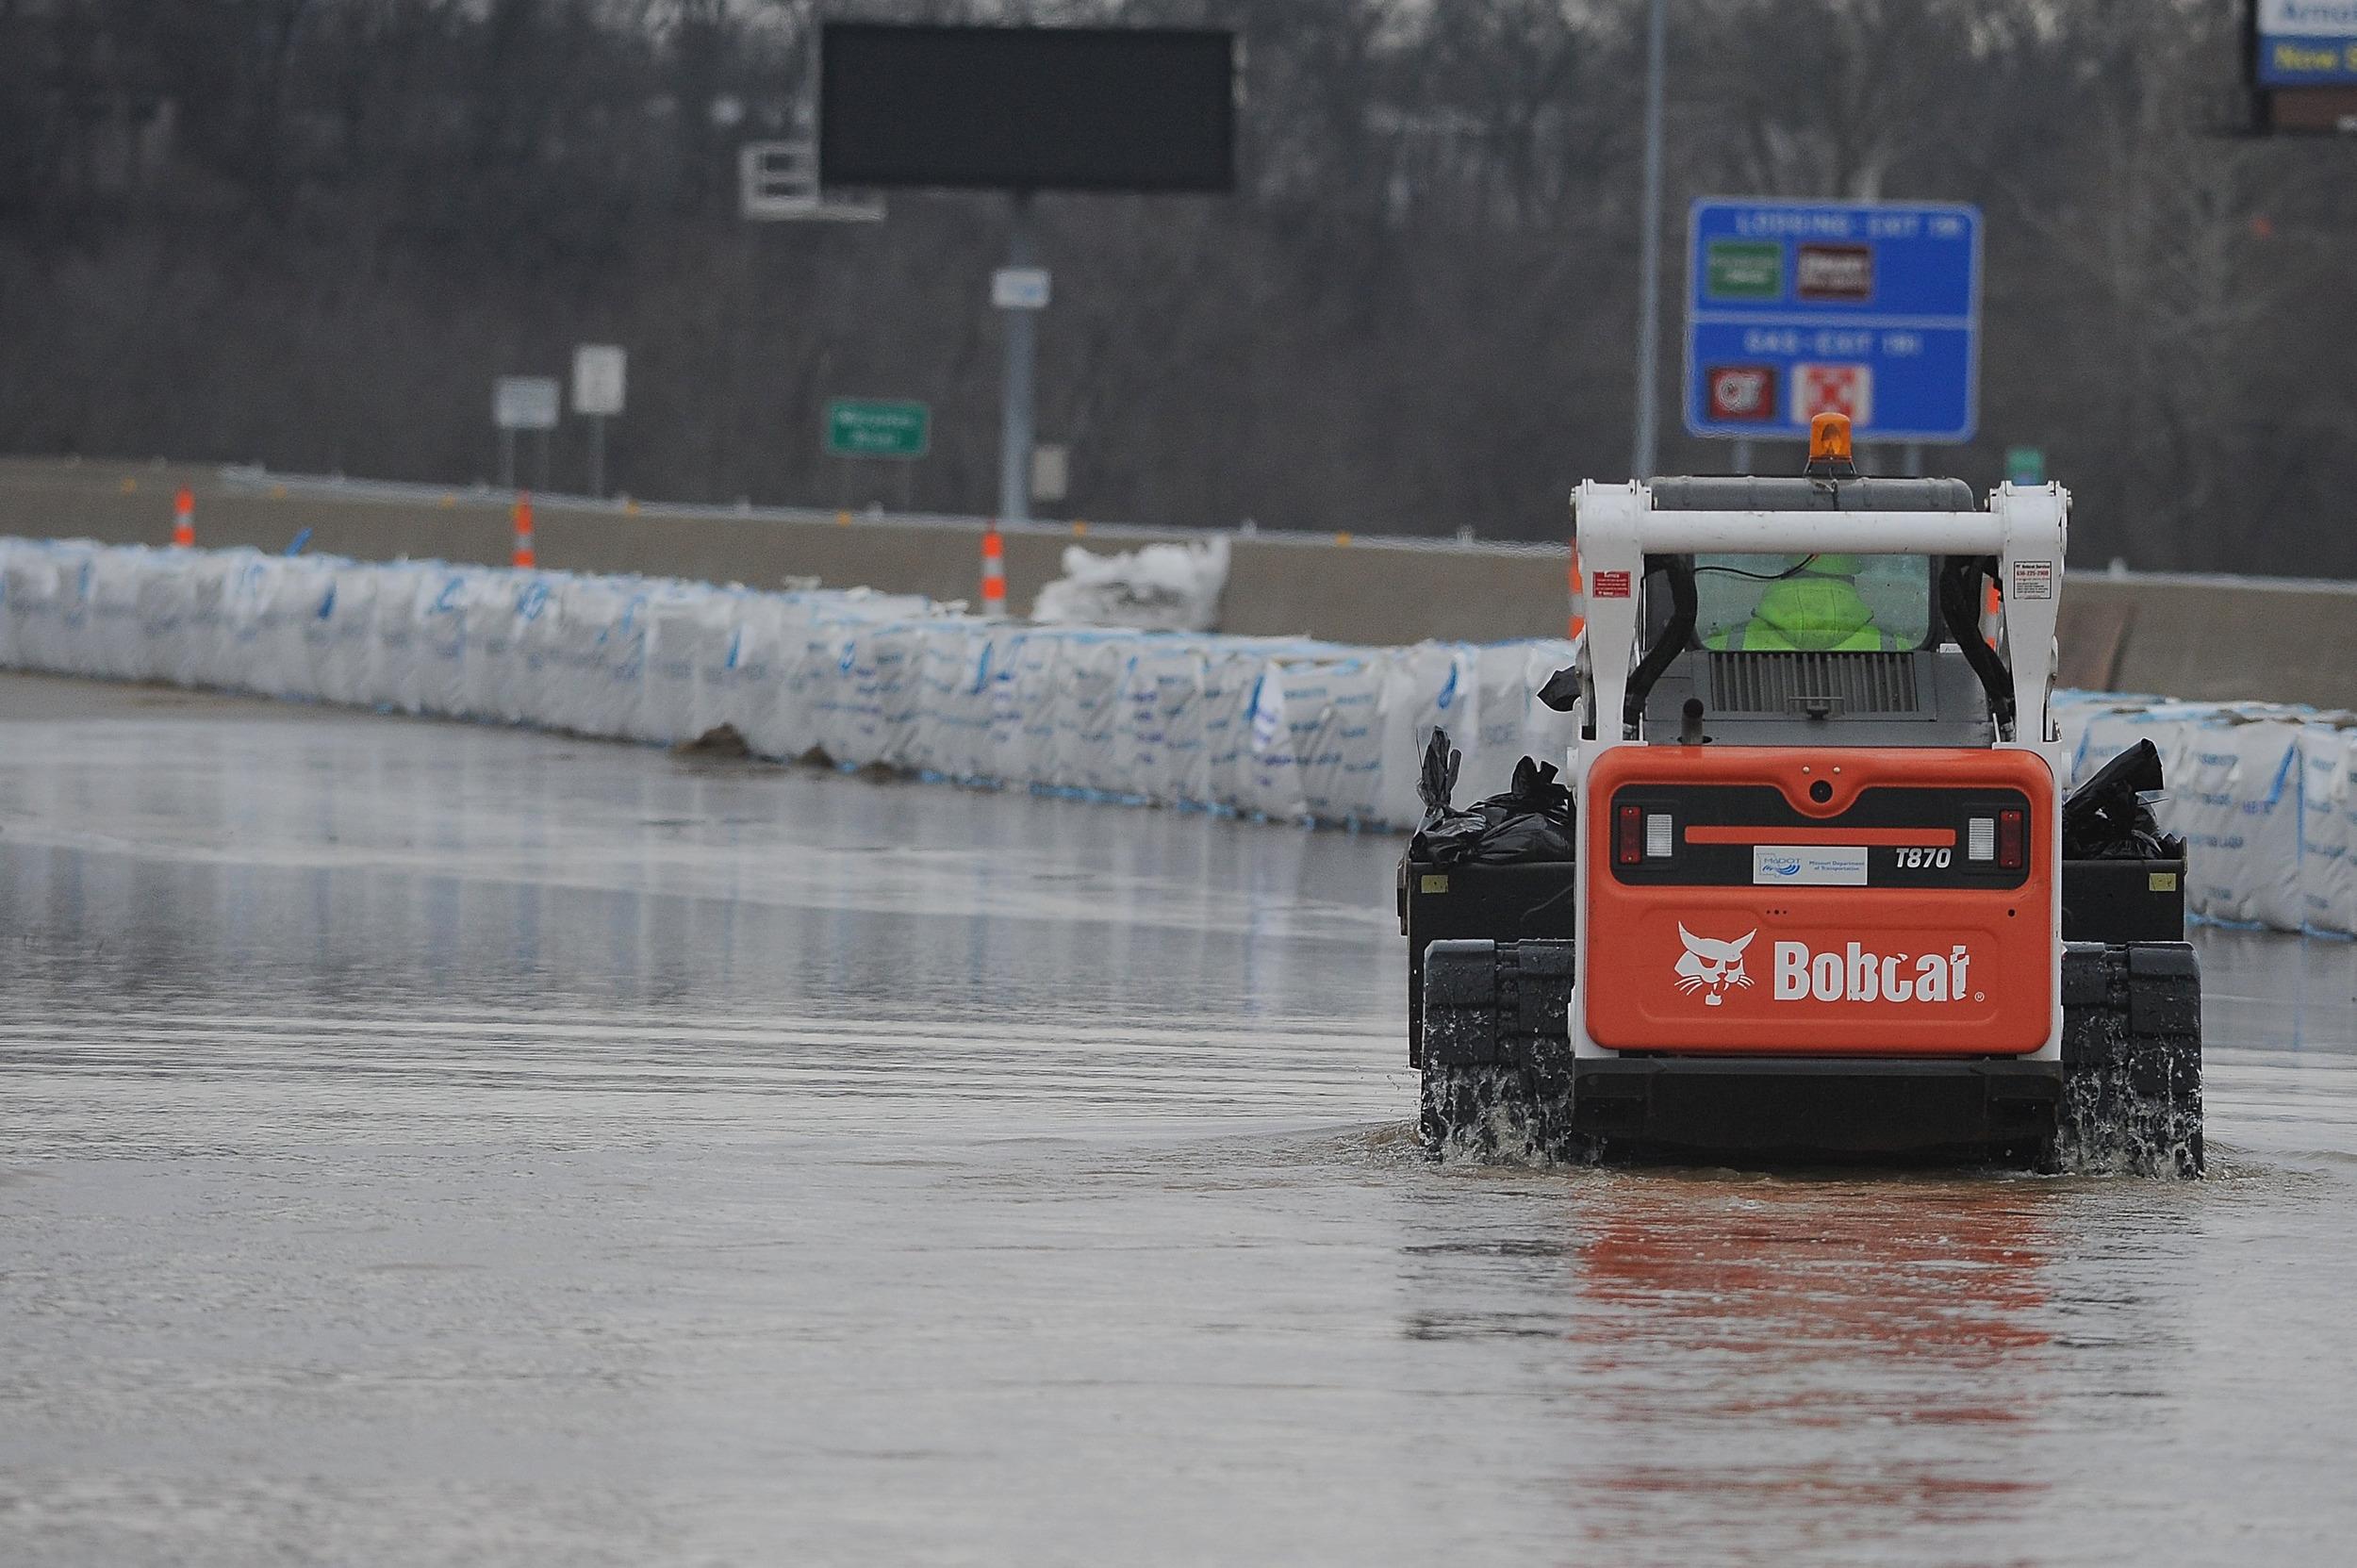 Flood Surge Moves 10 Times Faster Than Niagara Falls